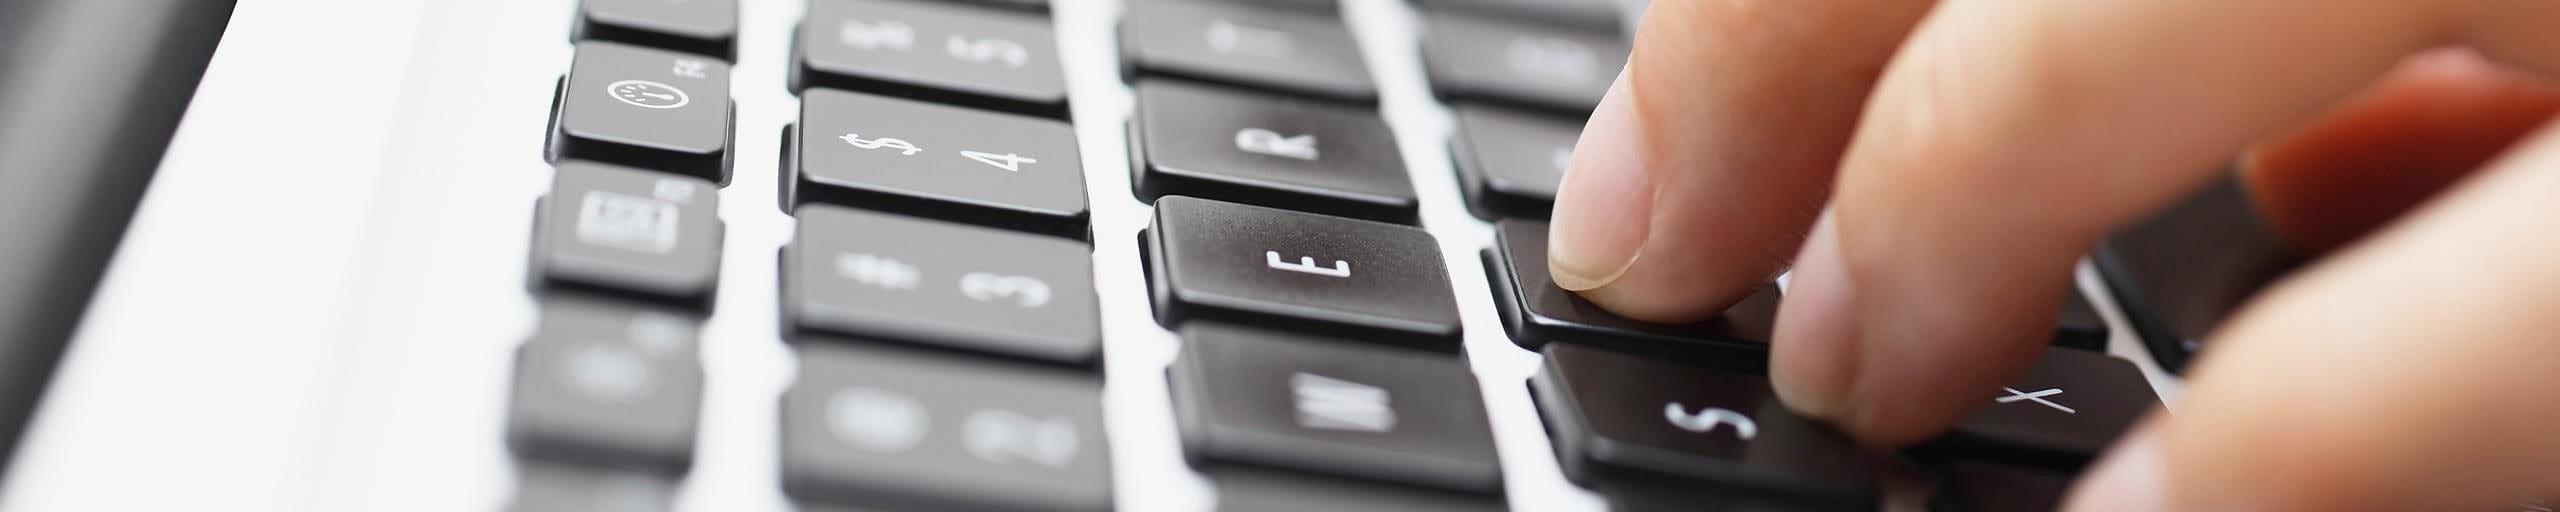 Una donna scrive al computer.